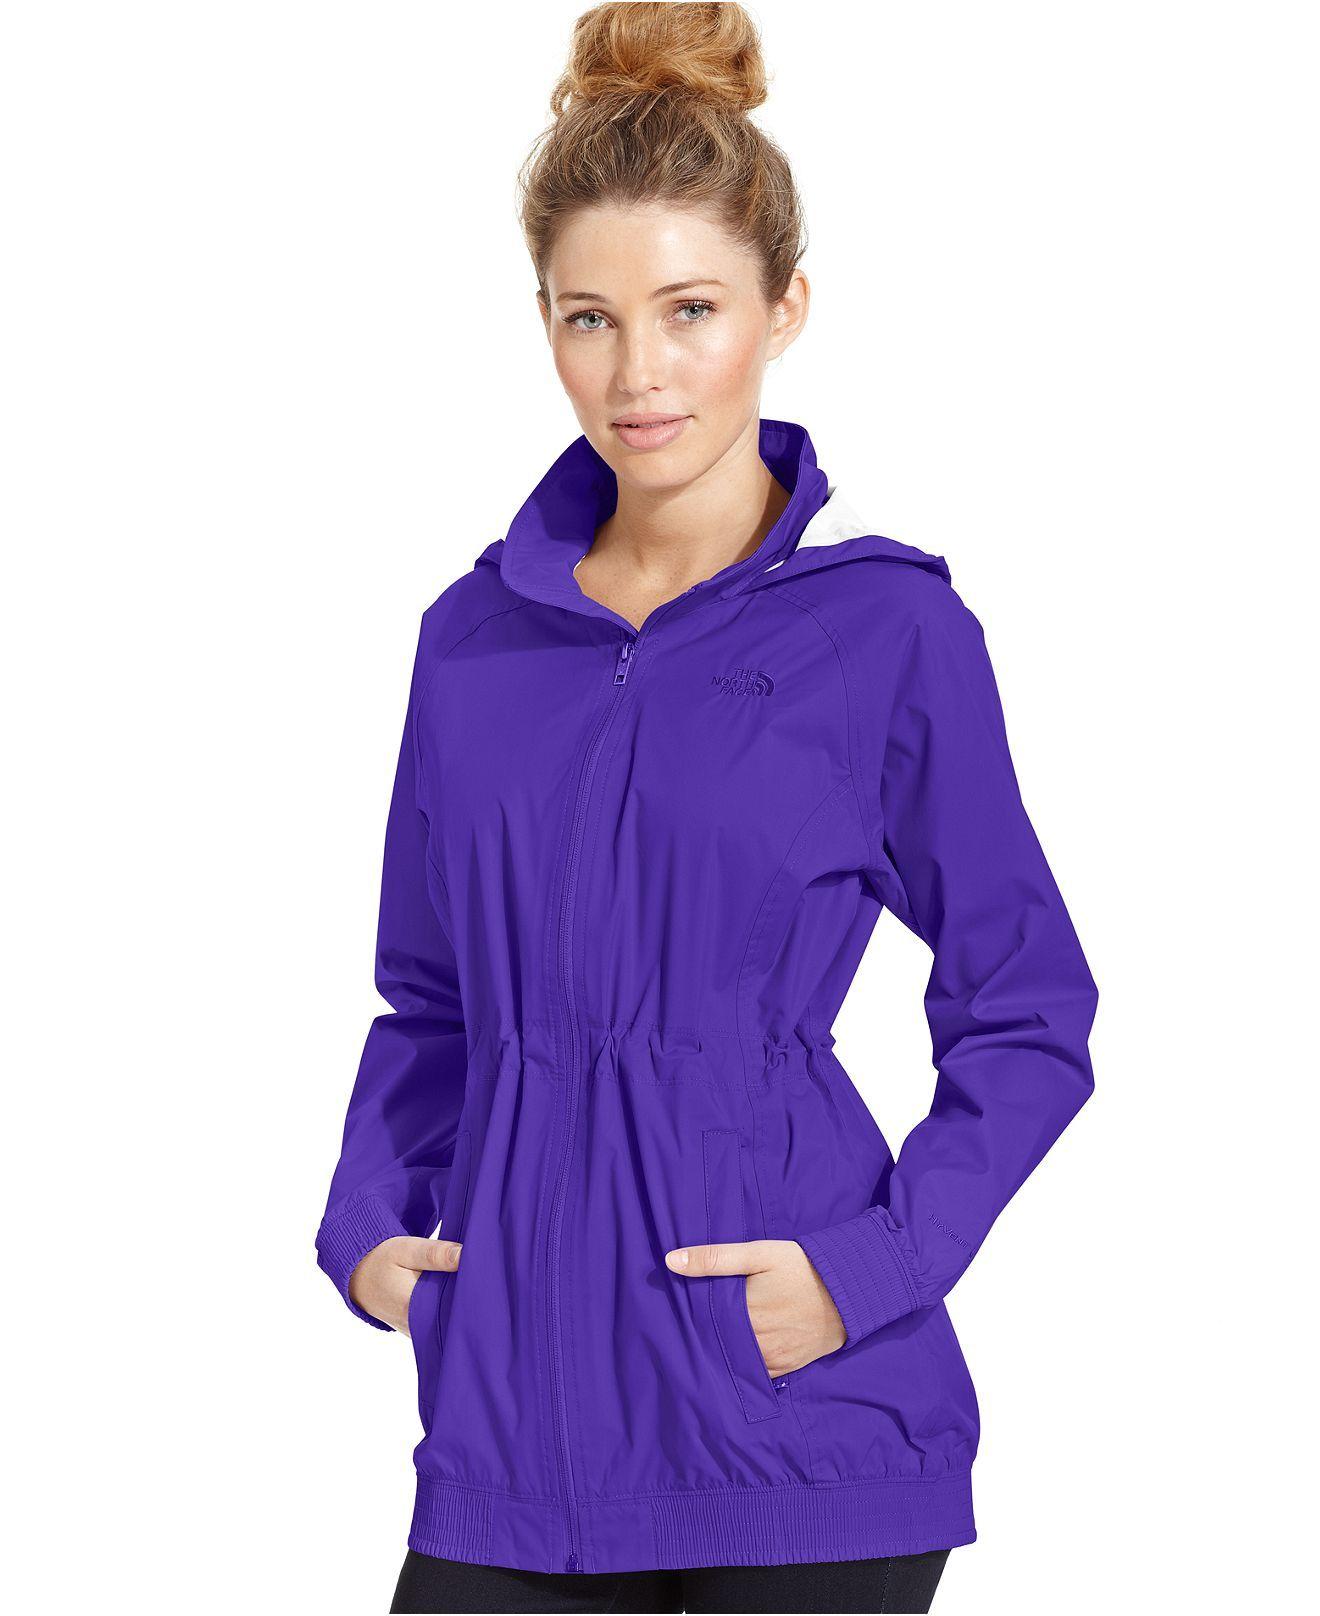 The North Face Jacket Sereyana Hooded Cinched Waist Anorak Active Jackets Hoodies Women Mac Blazer Jackets For Women North Face Jacket Coats For Women [ 1616 x 1320 Pixel ]